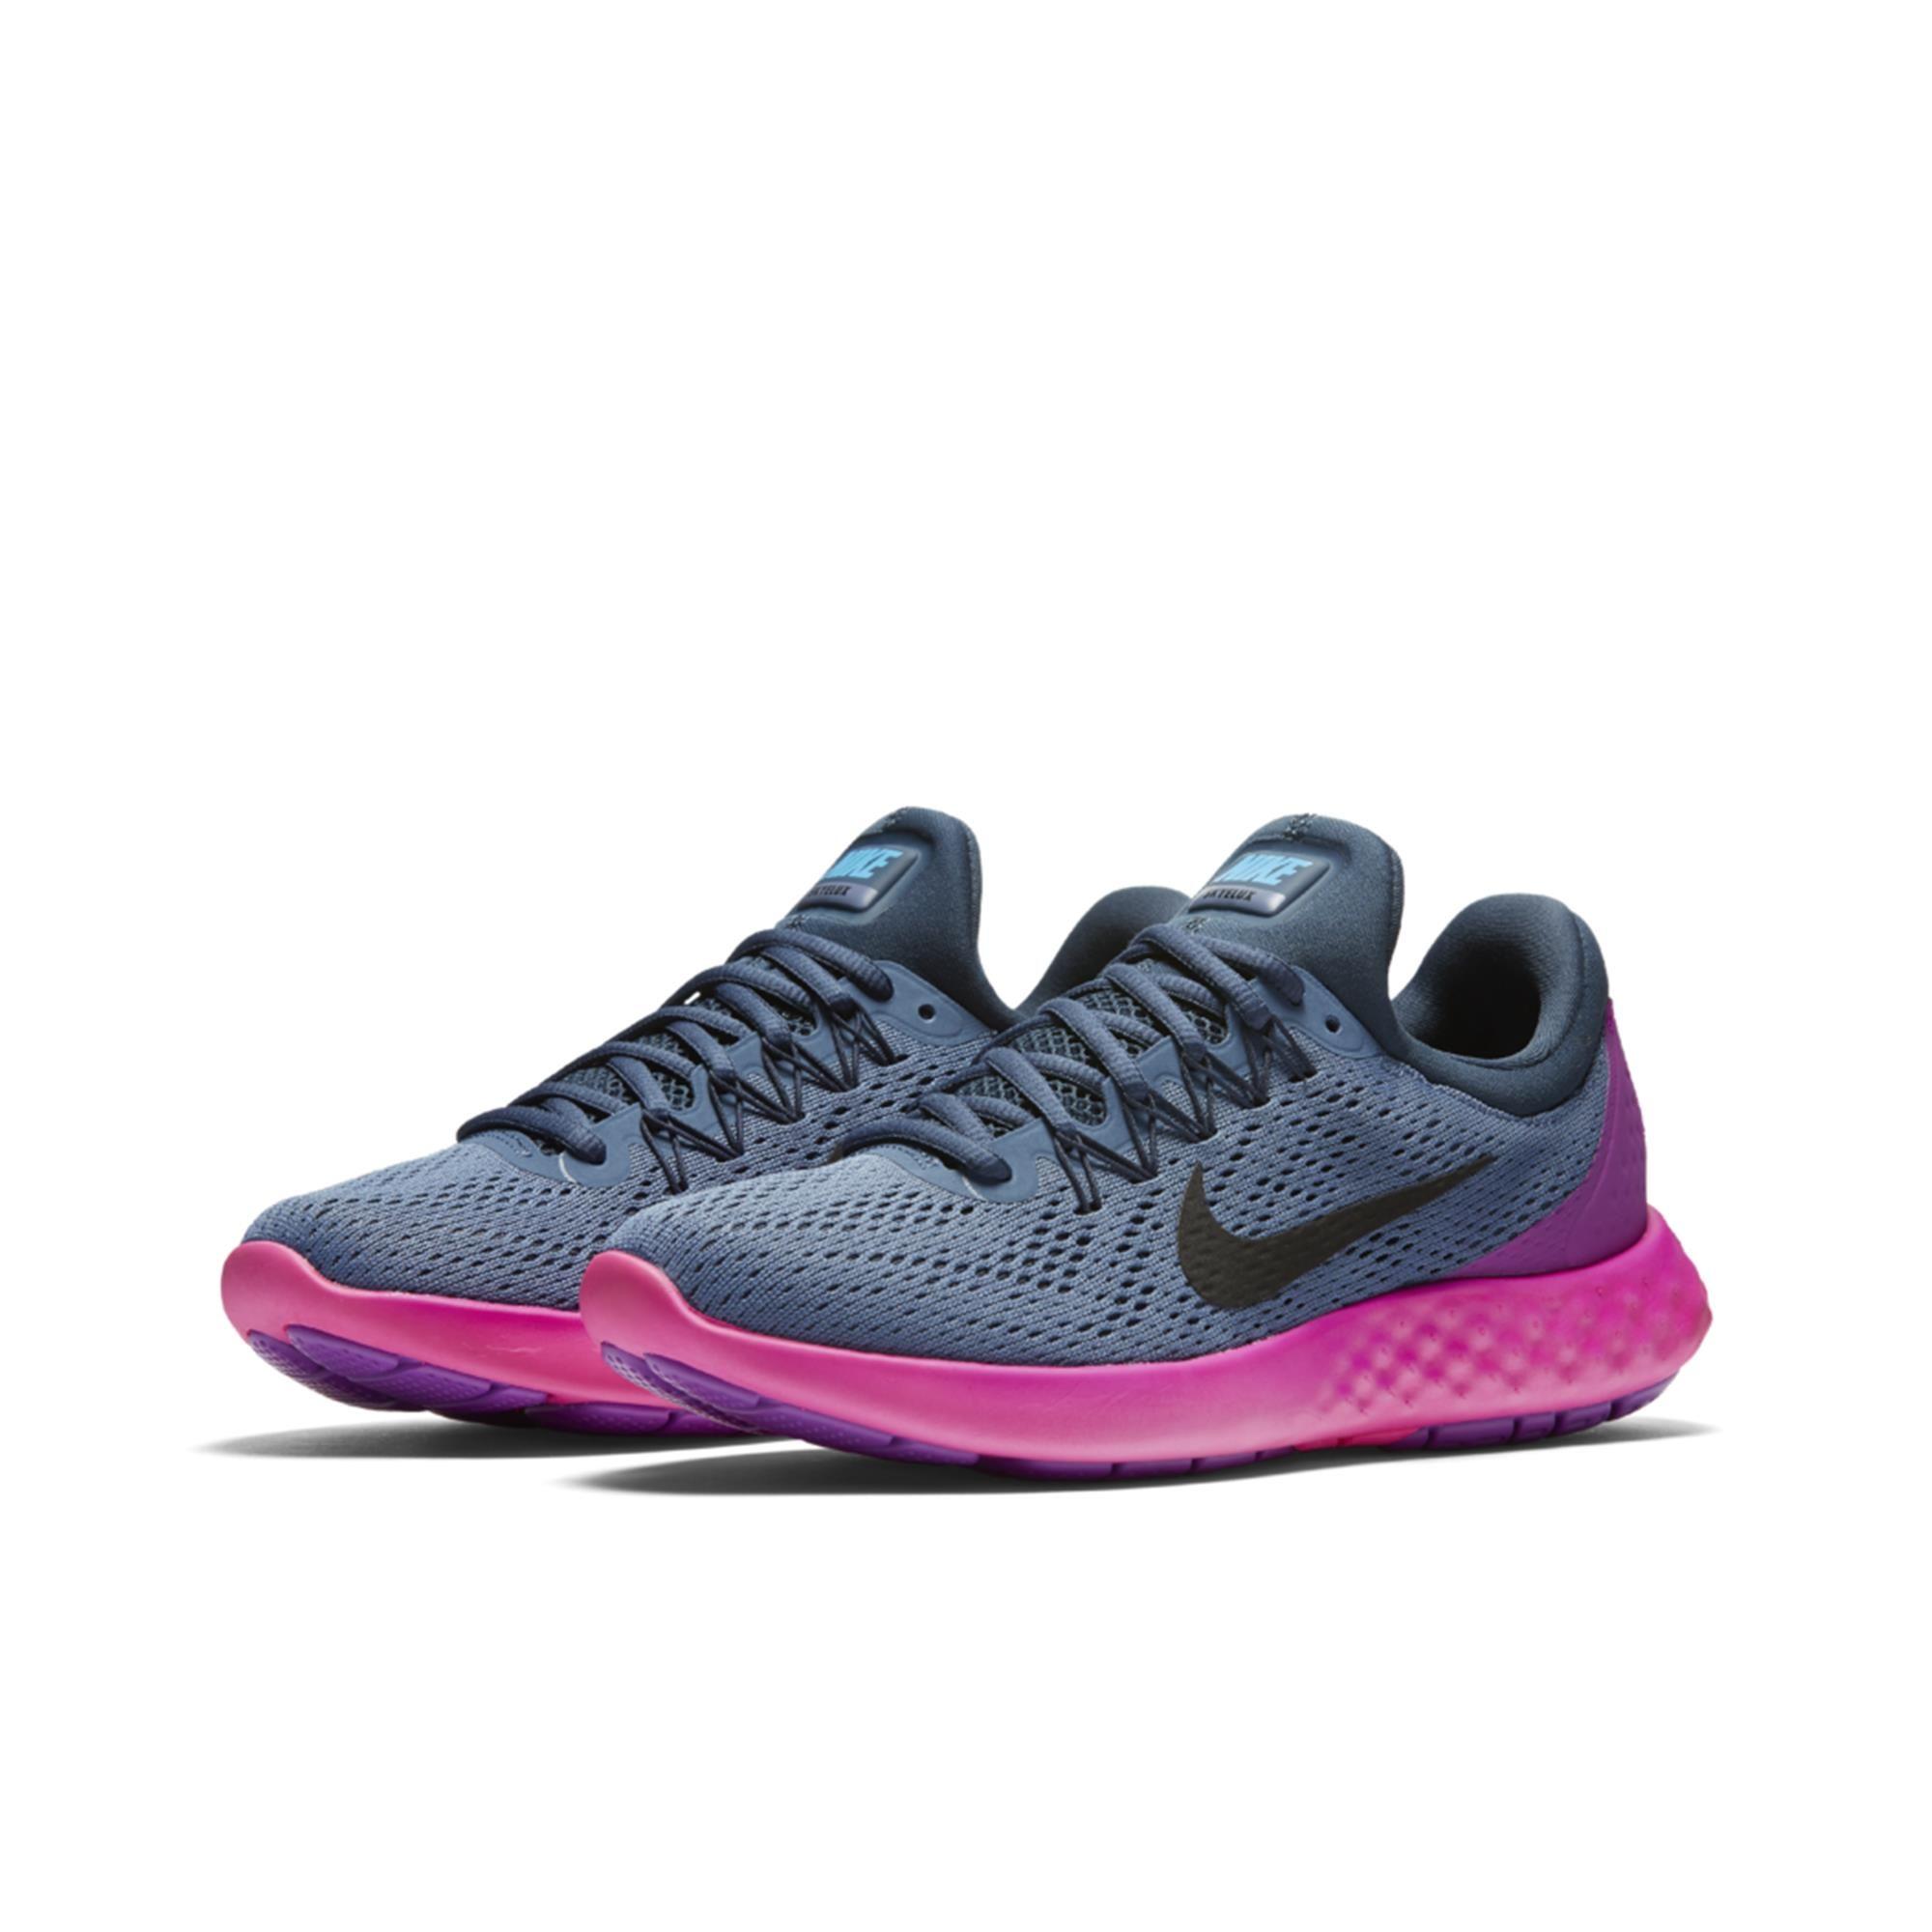 new style 1518f 67e1f ... Free 2013 3.0 V4 Hot Punch Reflective Silver Pure Platinum 511495 600  Tênis Nike Lunar Skyelux Feminino Nike ...